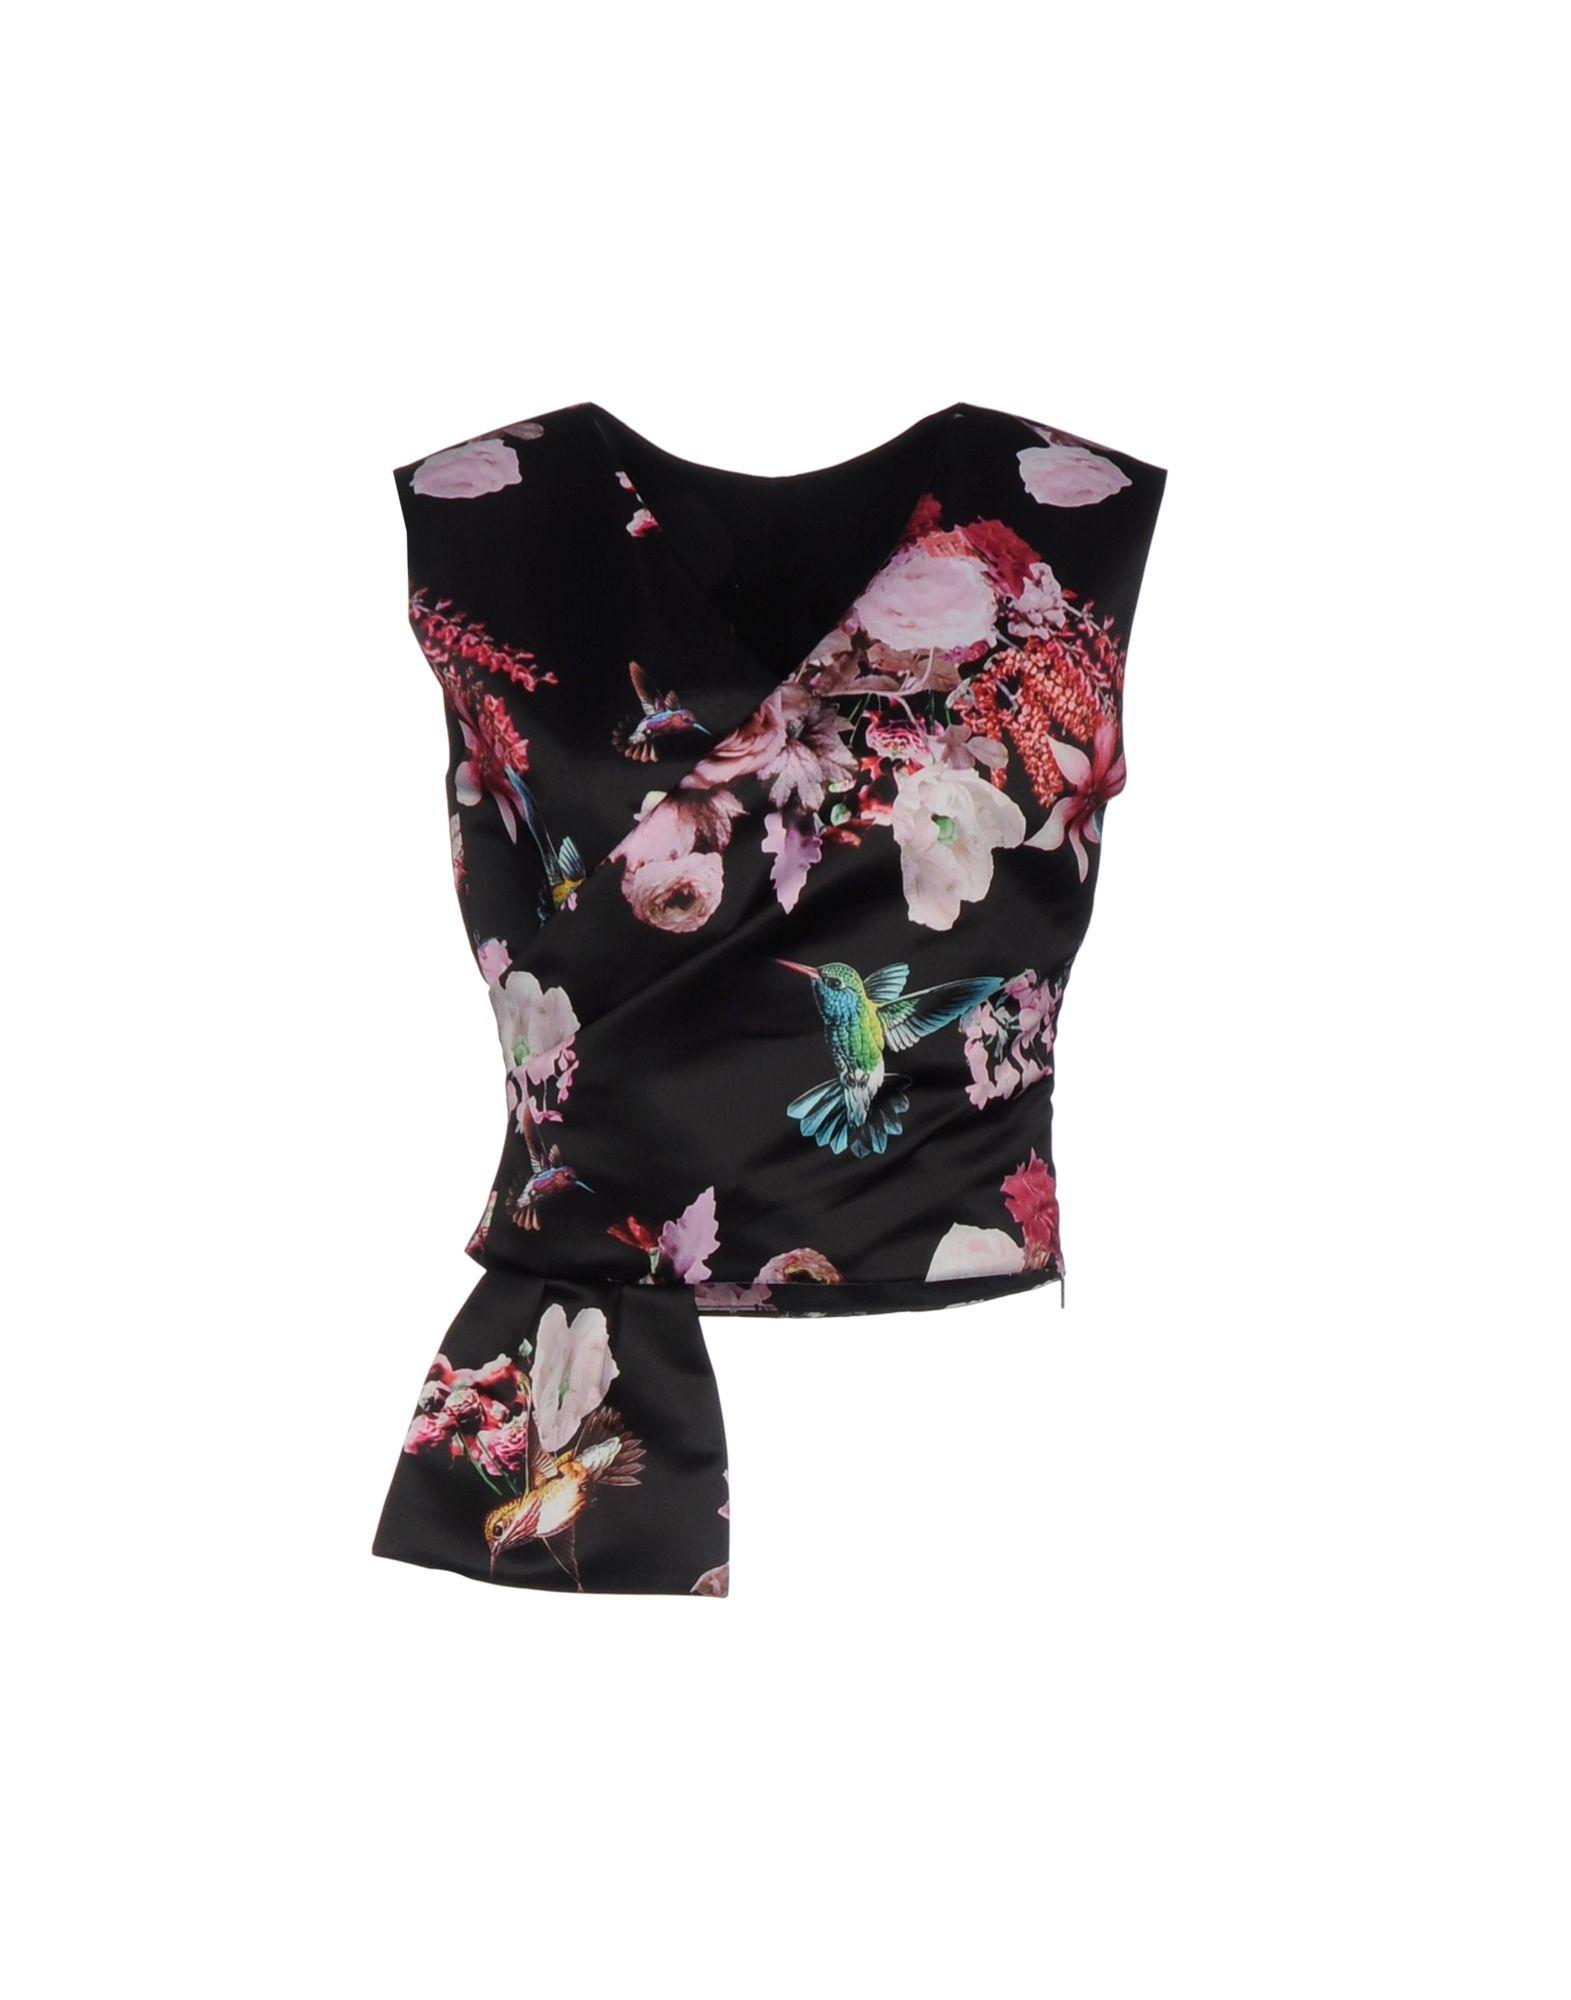 Top Pinko Donna - Acquista online su o94Vfo8mbk